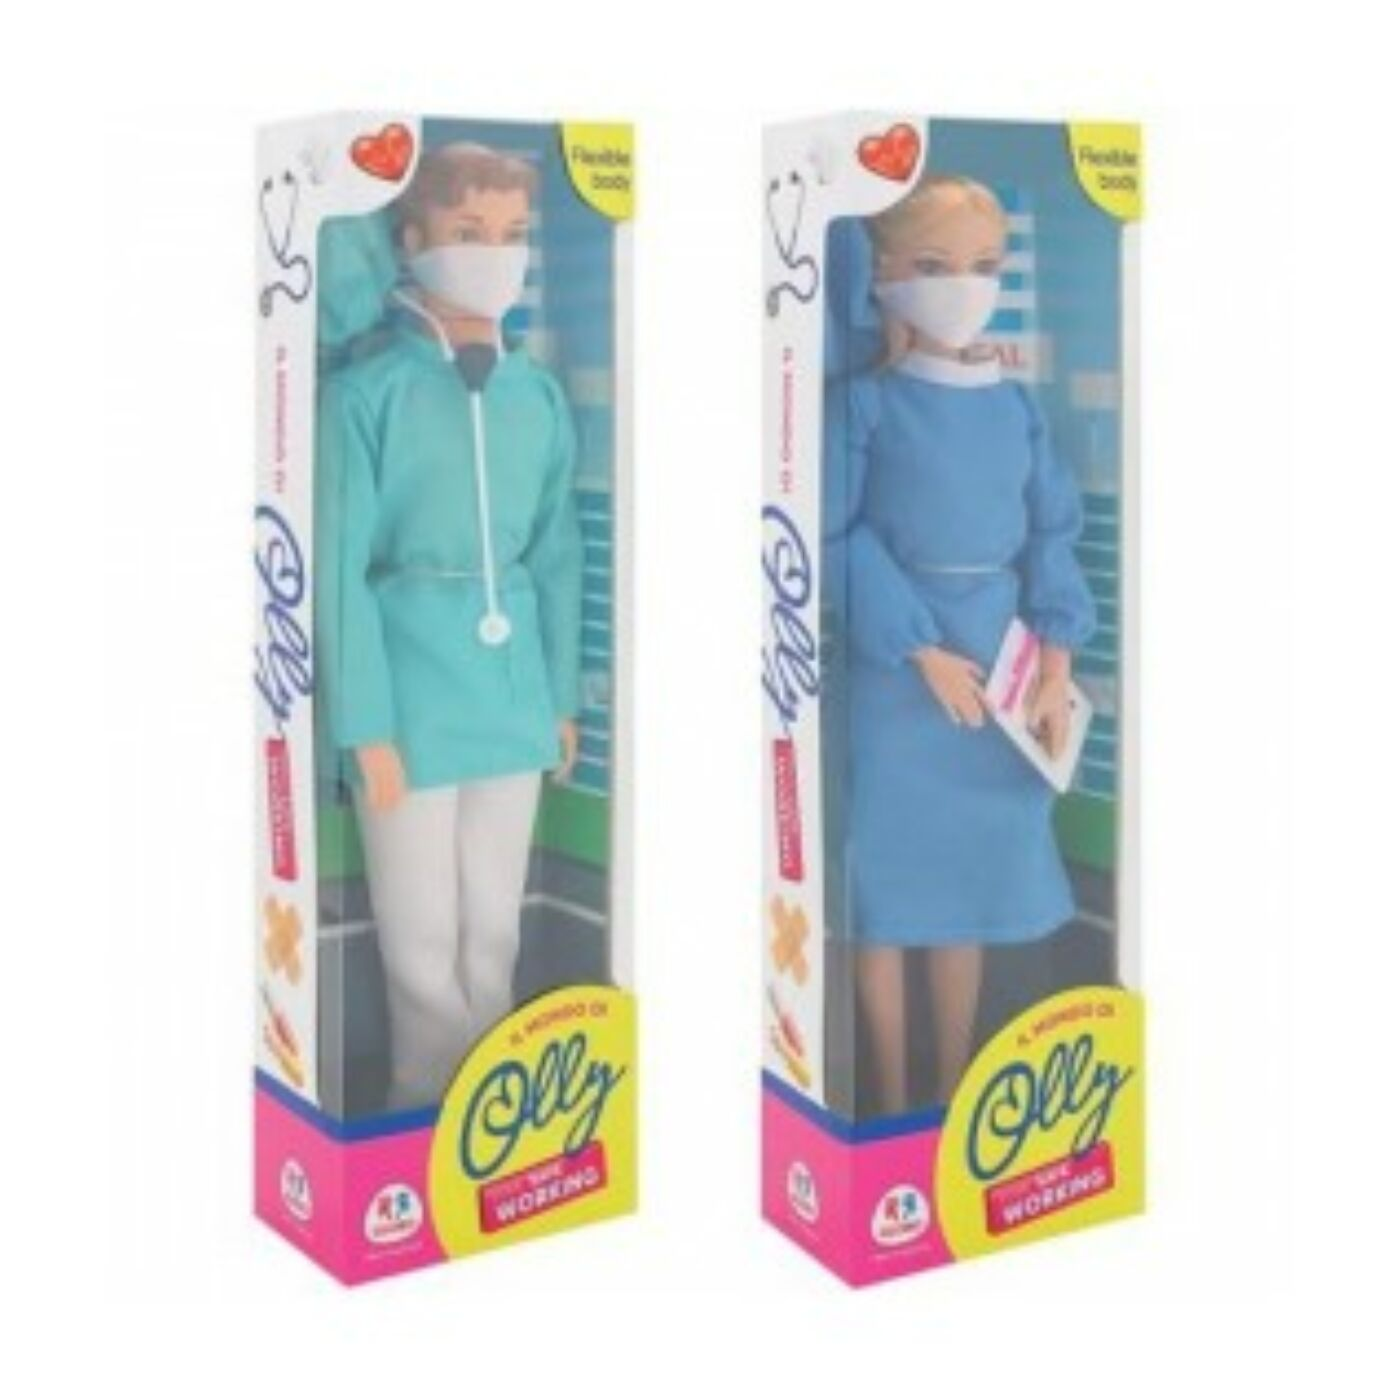 Doktor baba